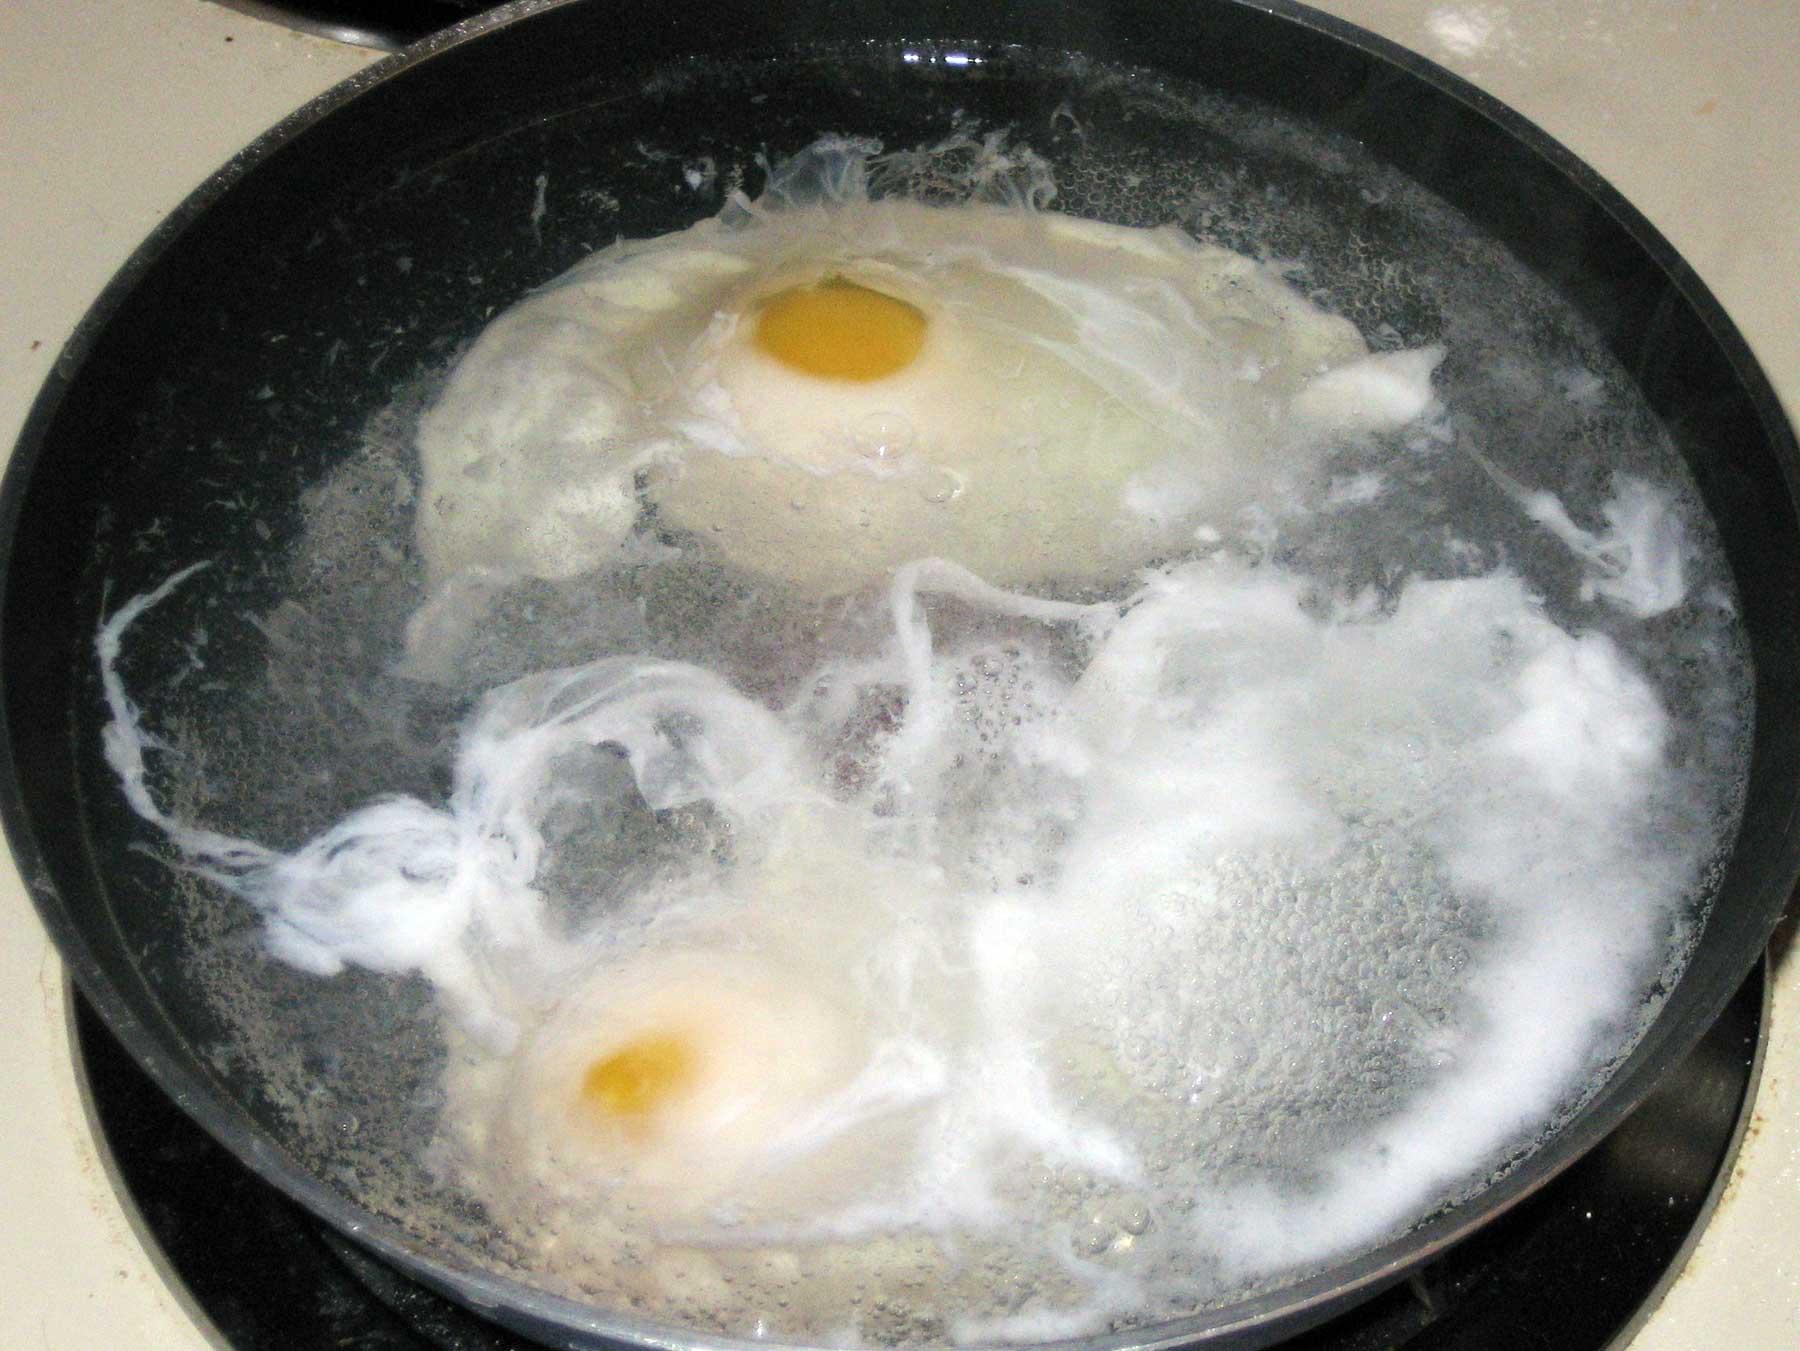 Eggs poaching in a pan of water